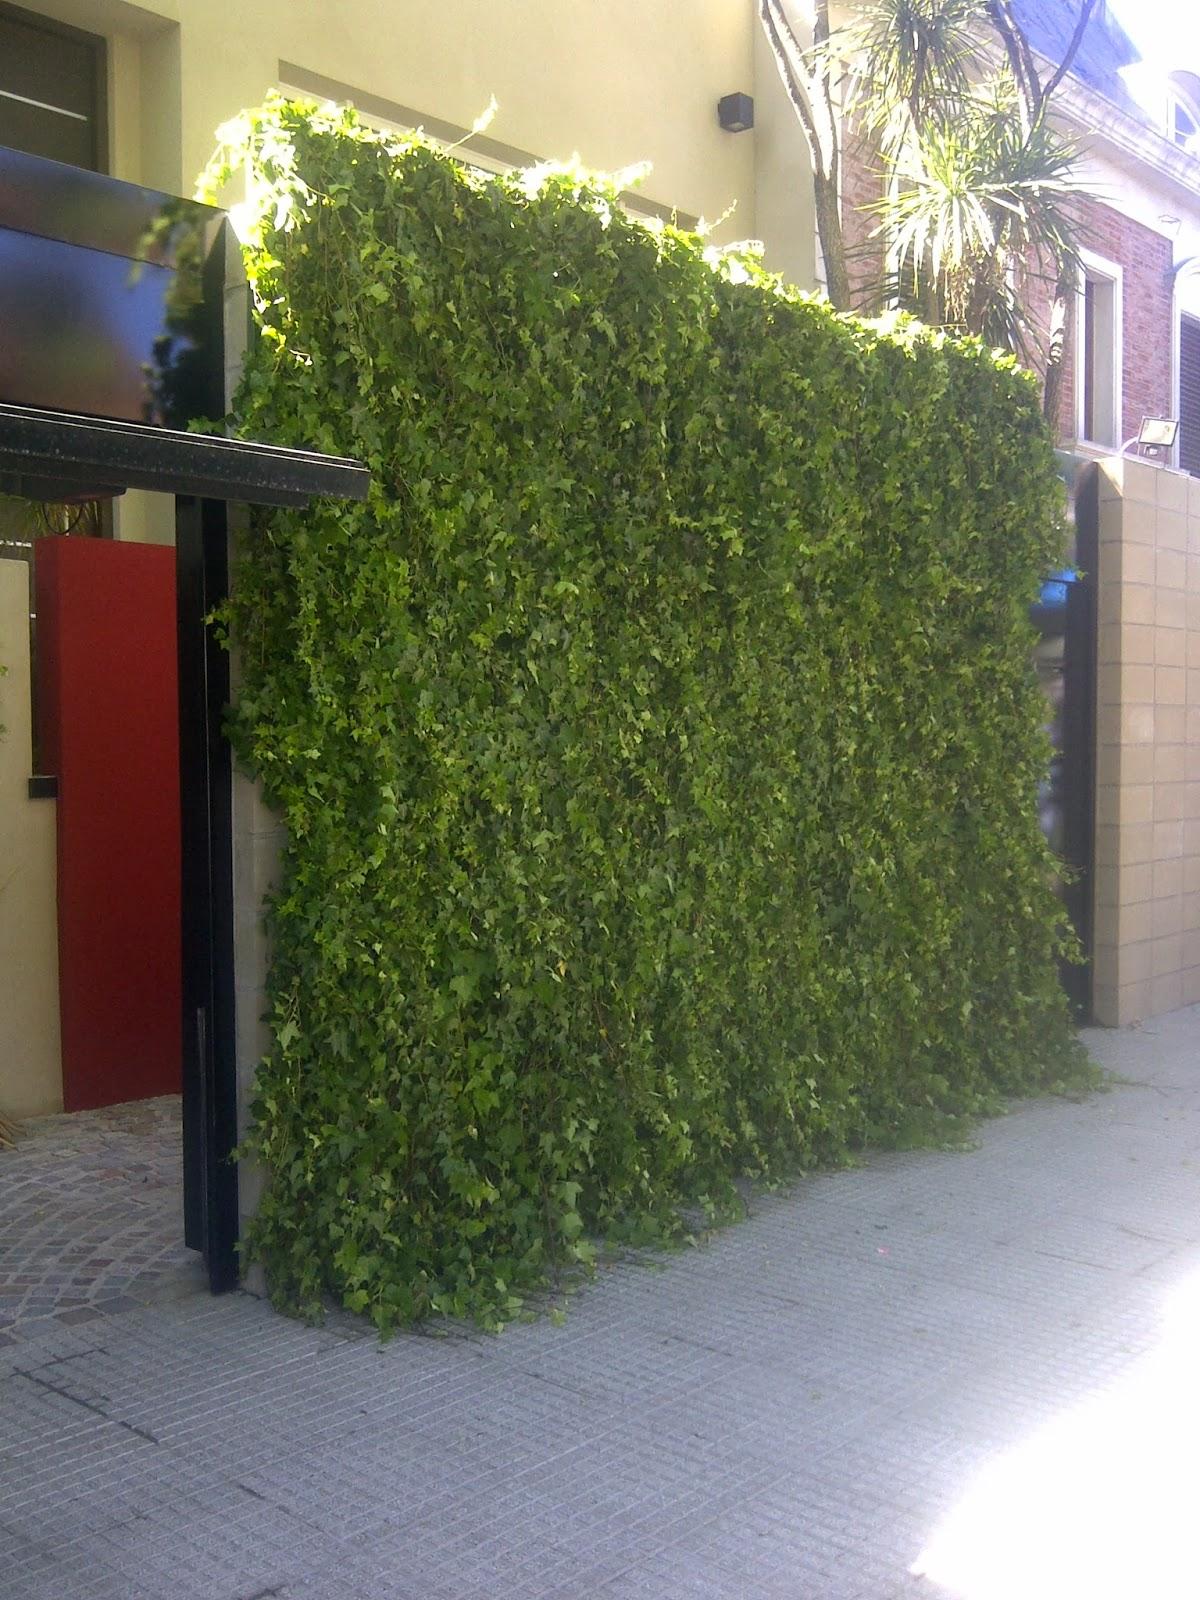 Enredaderas Plantas para paredes verdes